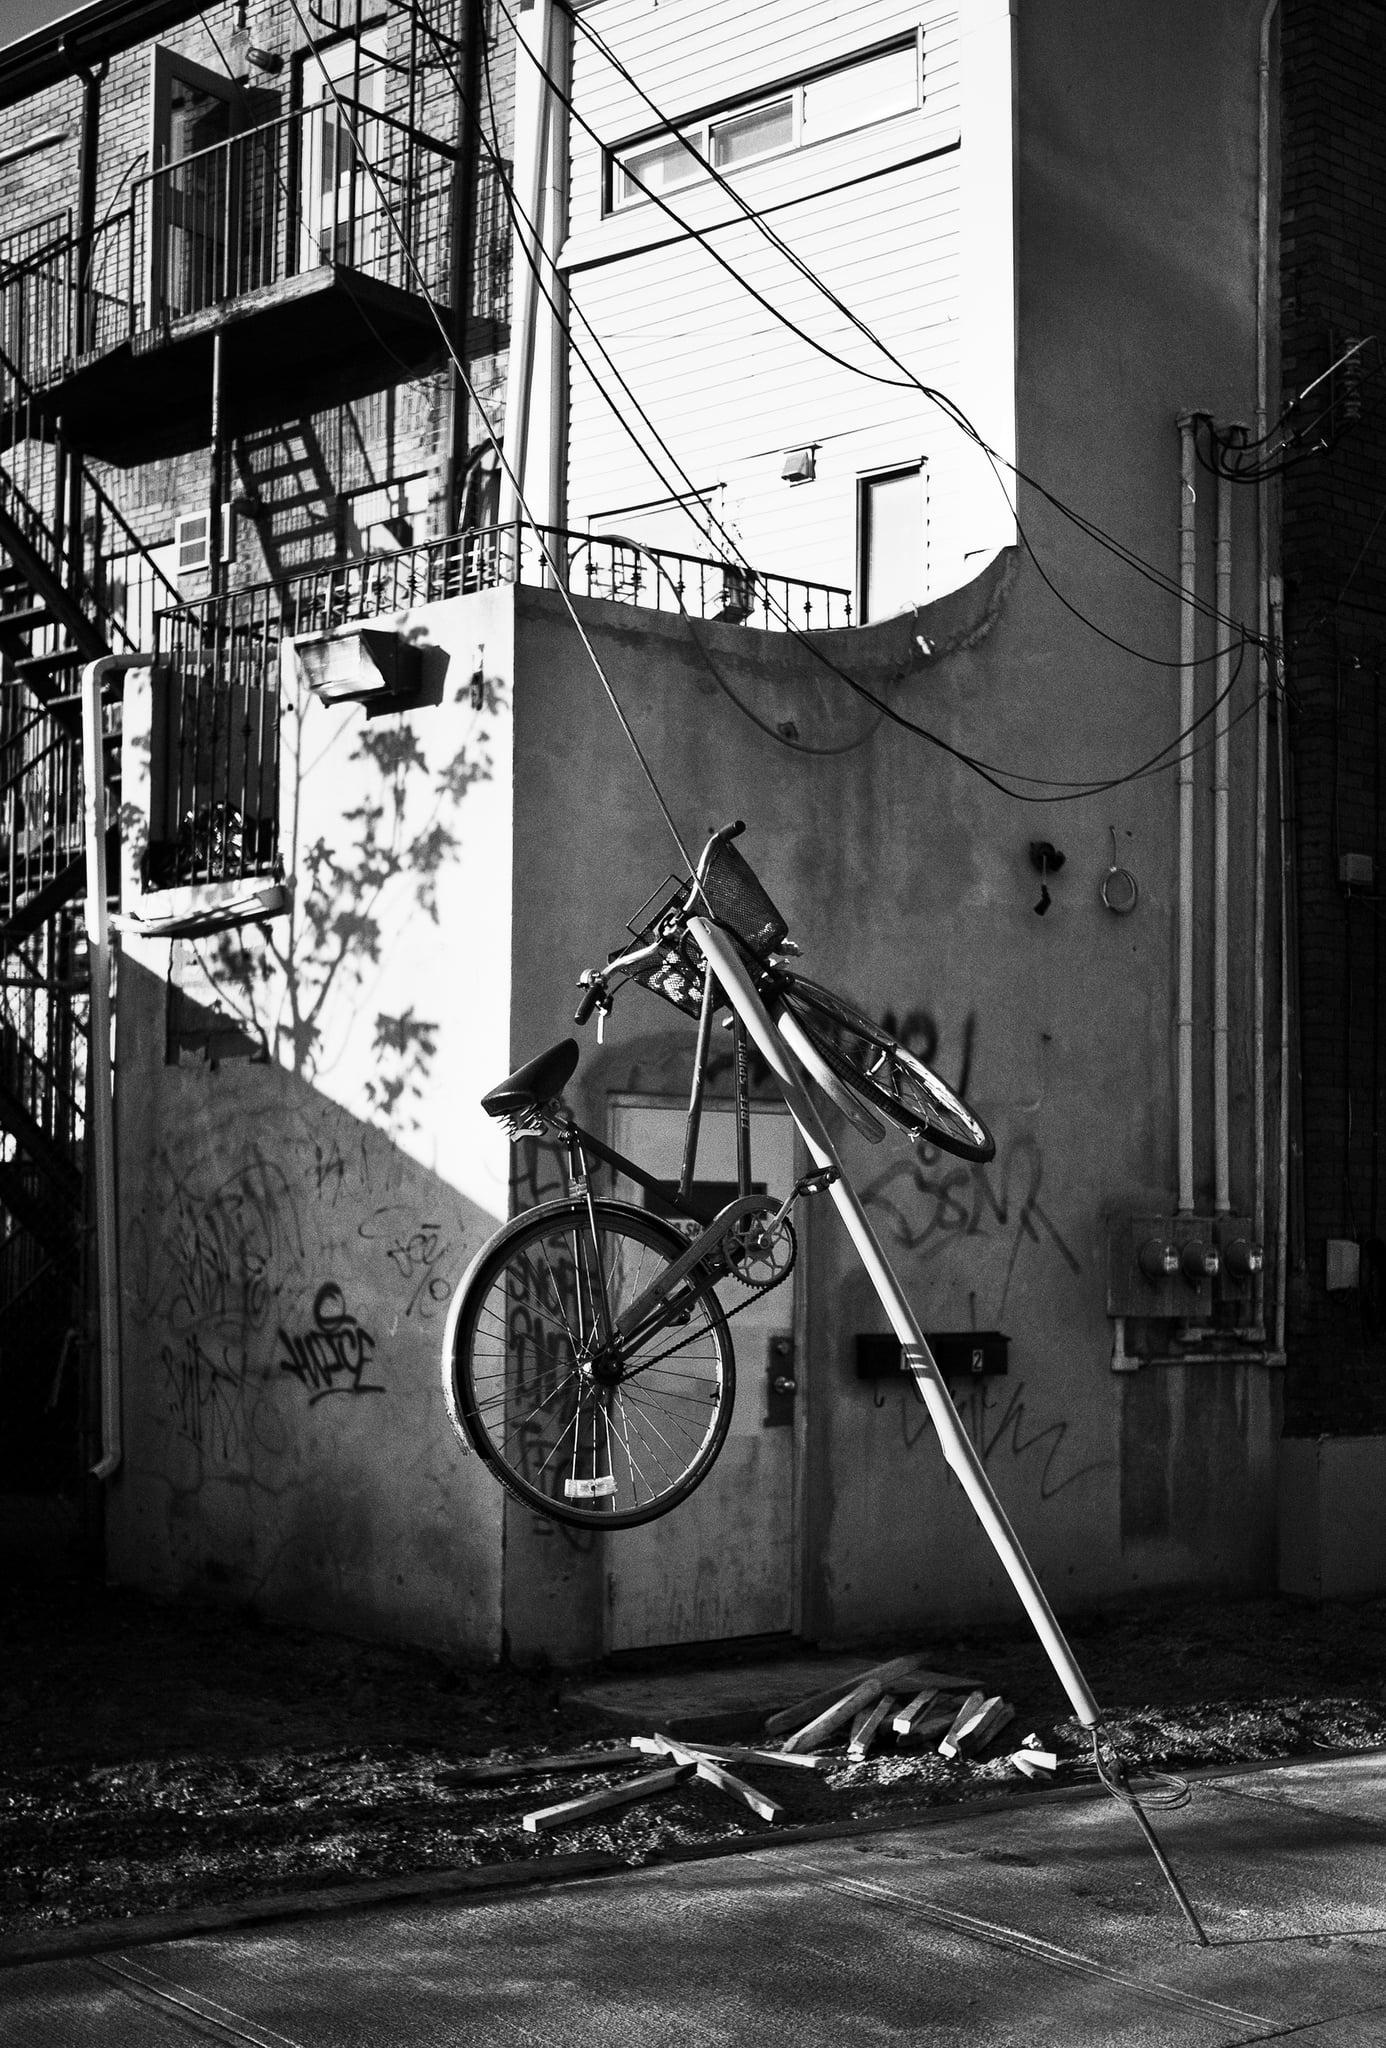 blue-hanging-bike_britain-street_01.jpg